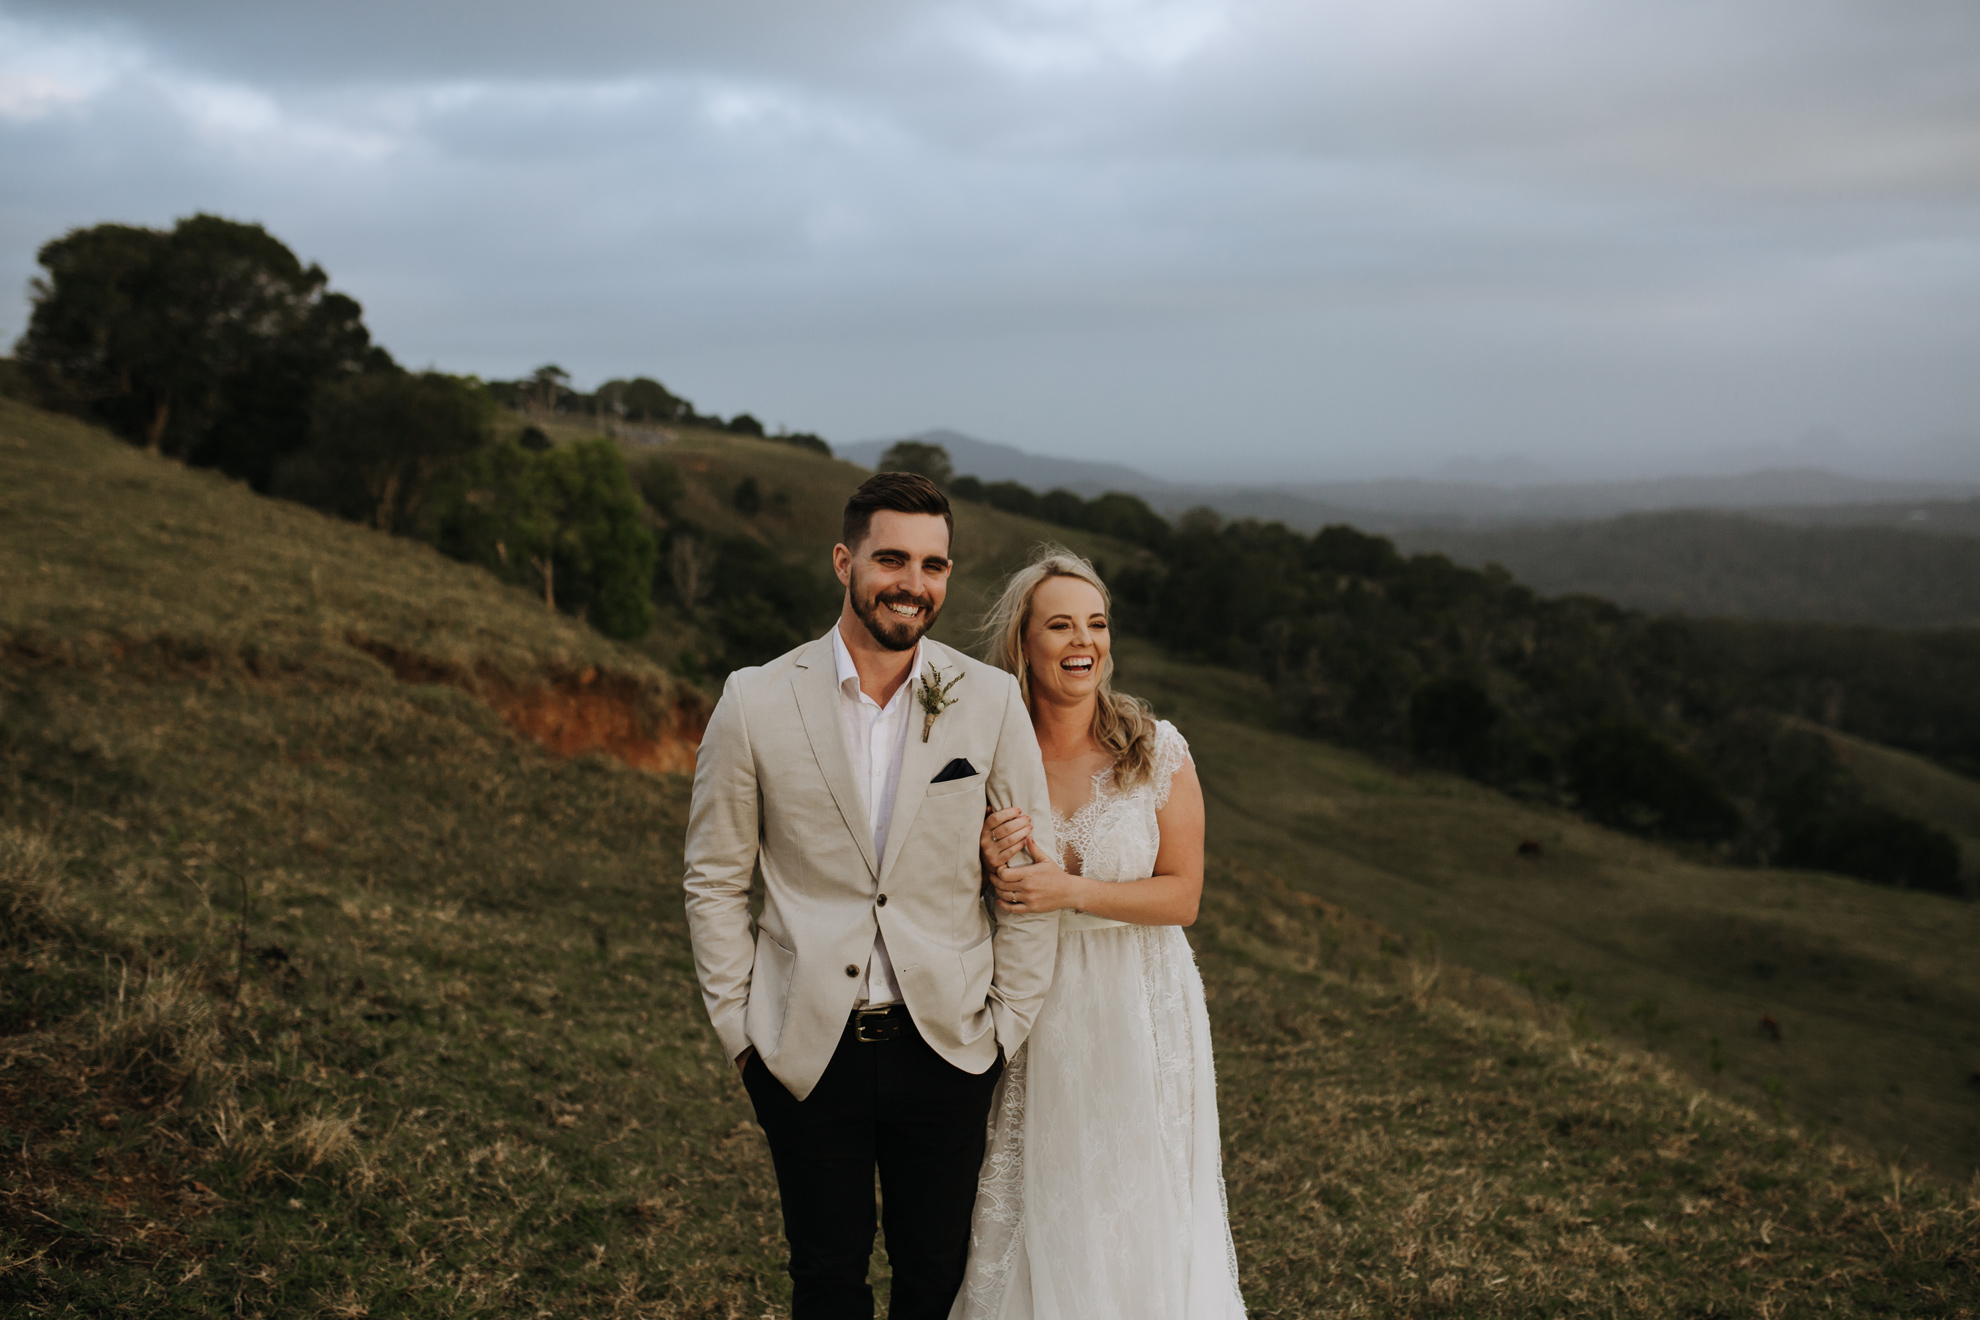 067-Kirby_Lewis_Maleny_Manor_Wedding.jpg